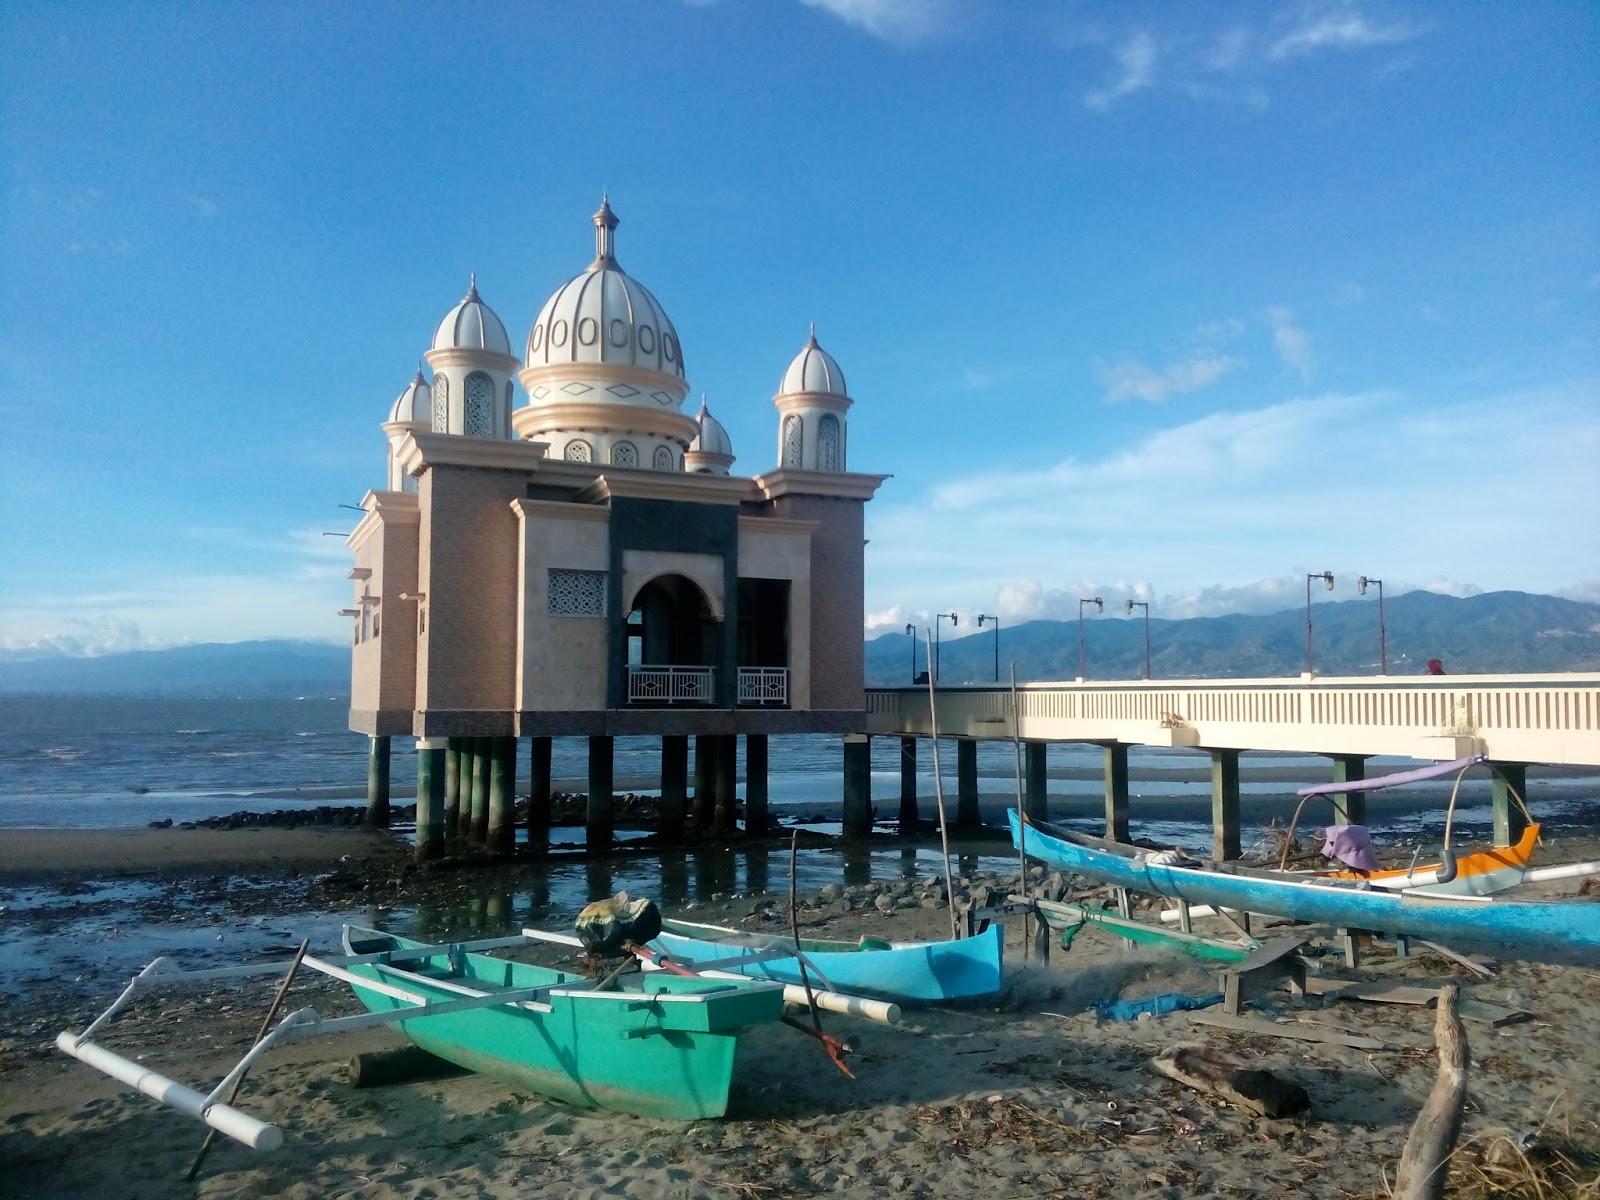 Raja Ari Hidayat Berceloteh Palu Ketika Sekitar Masjid Terapung Penjual